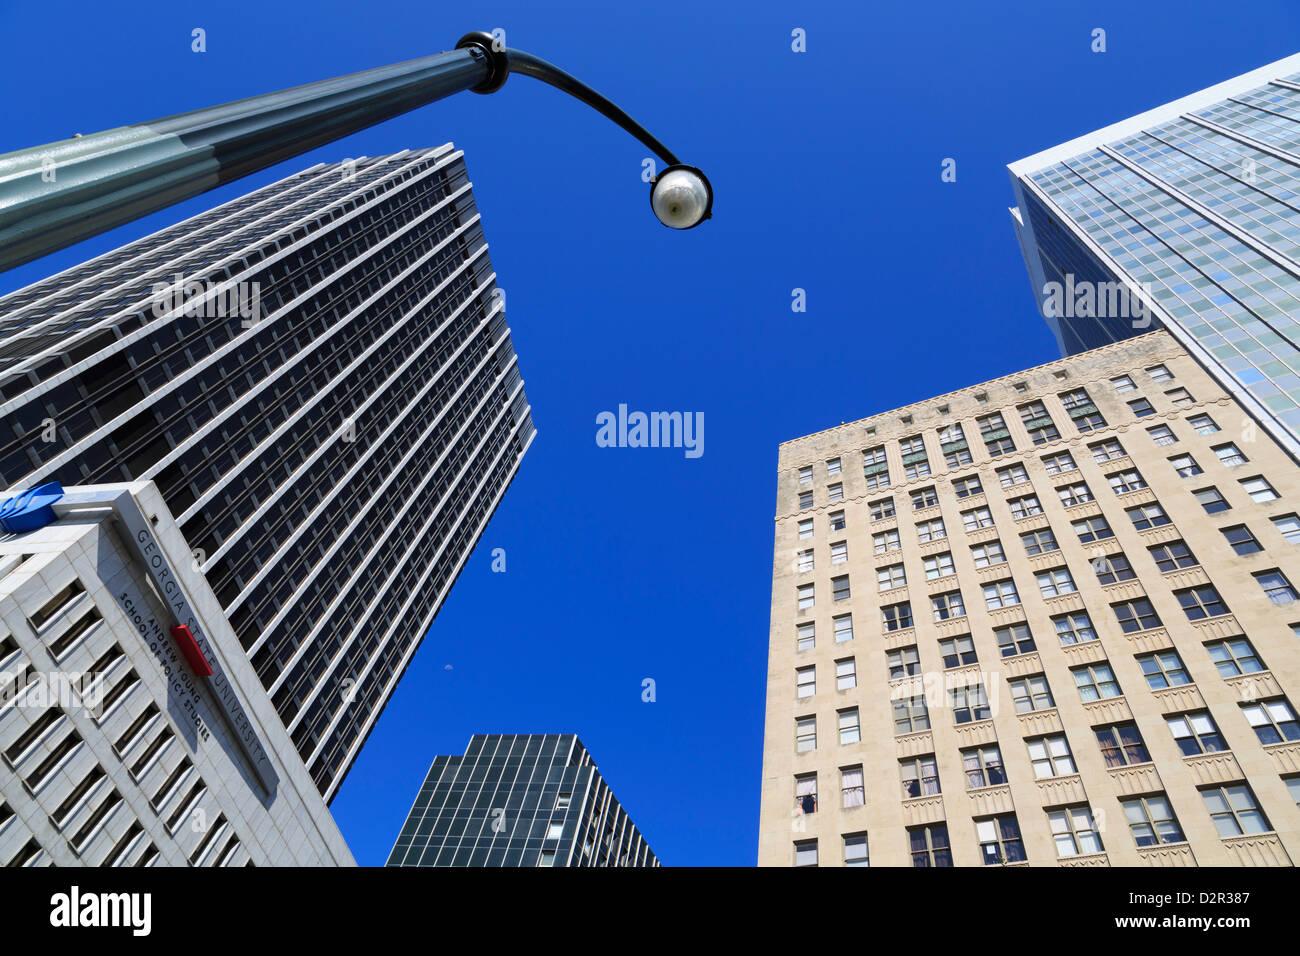 Skyscrapers in the Five Points District, Atlanta, Georgia, United States of America, North America - Stock Image